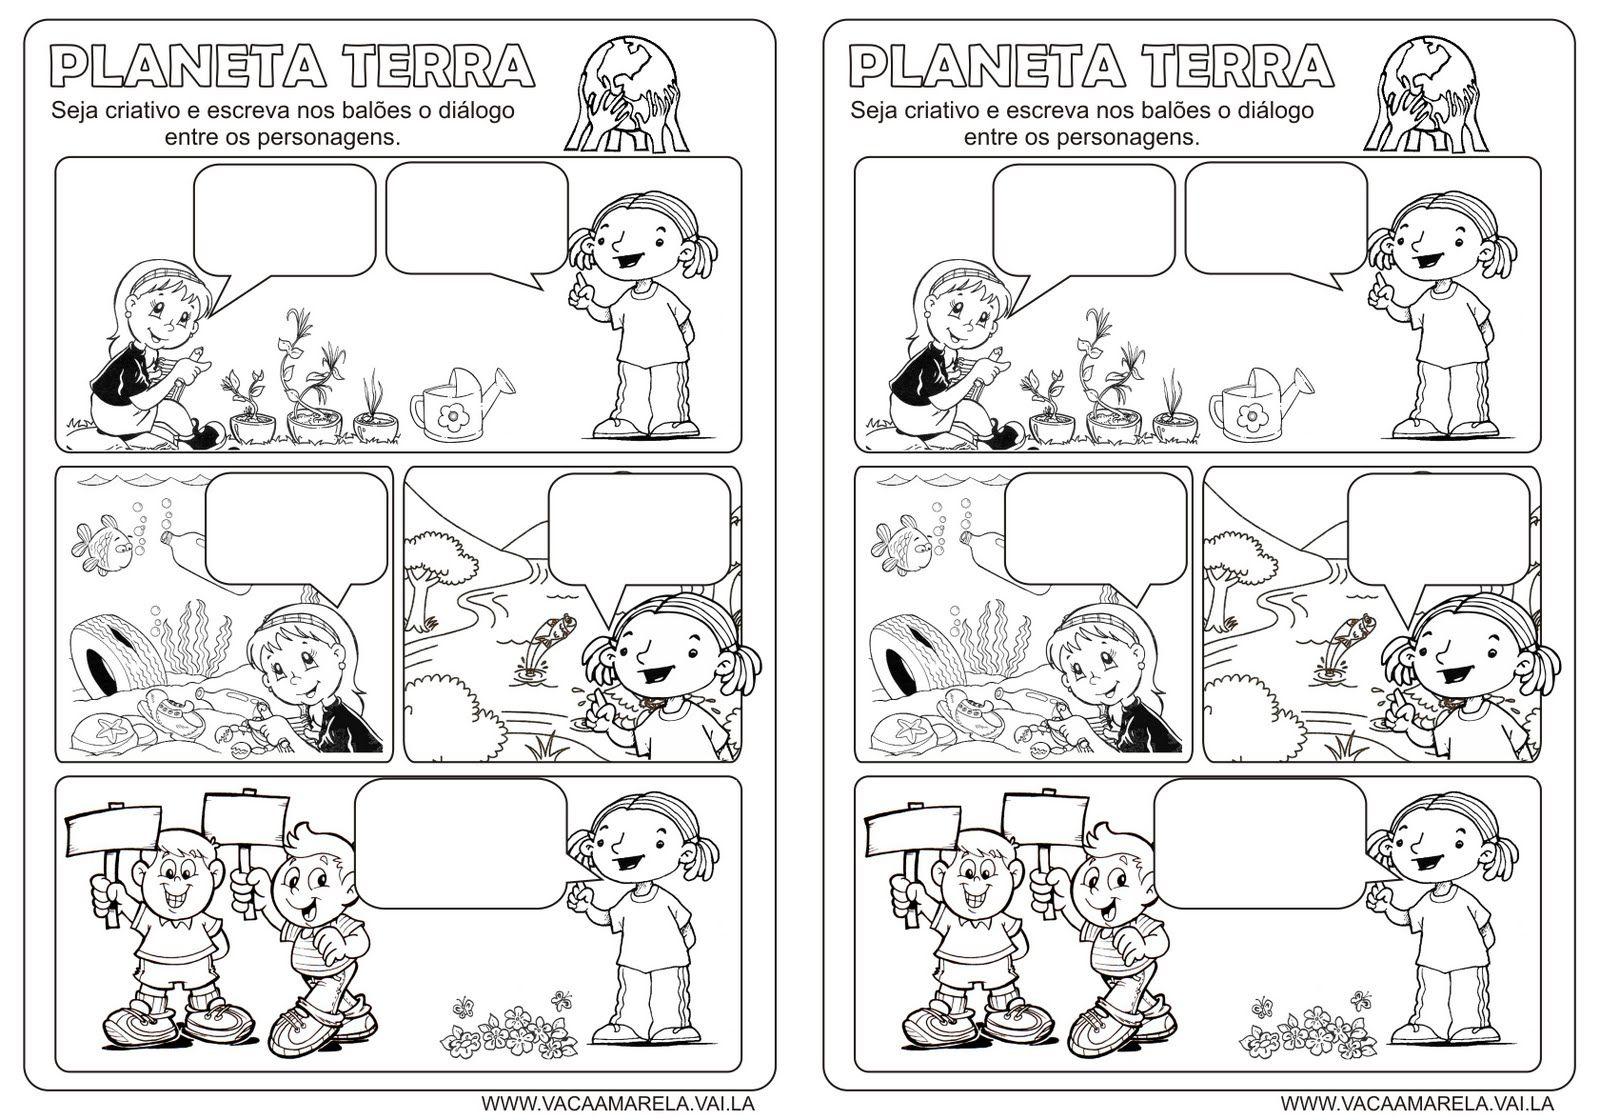 Historia Em Quadrinhos Historia Em Quadrinhos Quadrinhos